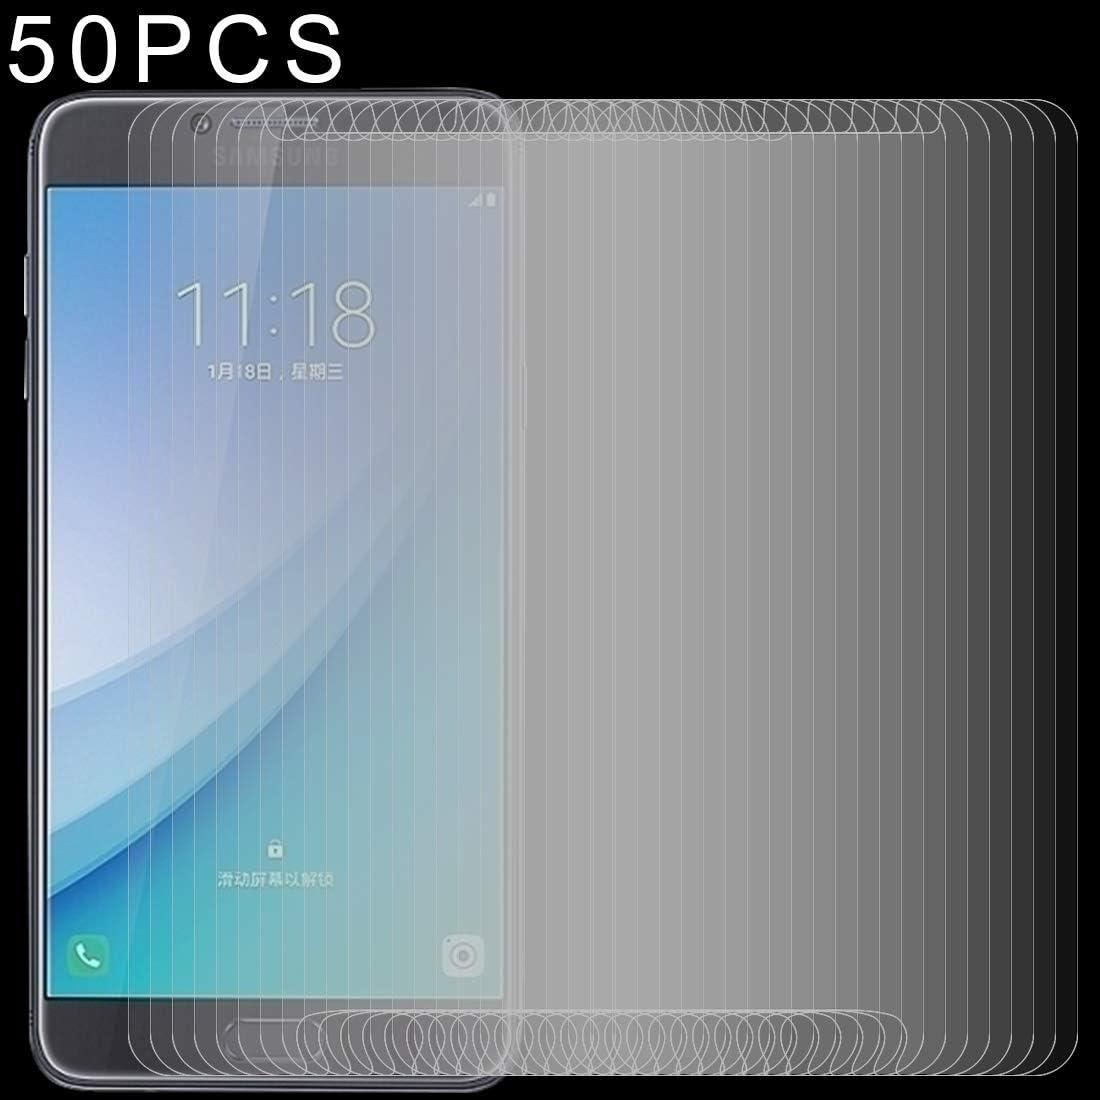 Pokjsofjnjlfkl Phone Accessories 50 PCS 0.26mm 9H 2.5D Tempered Glass Film for Galaxy C7 Pro Screen Protectors for Phone